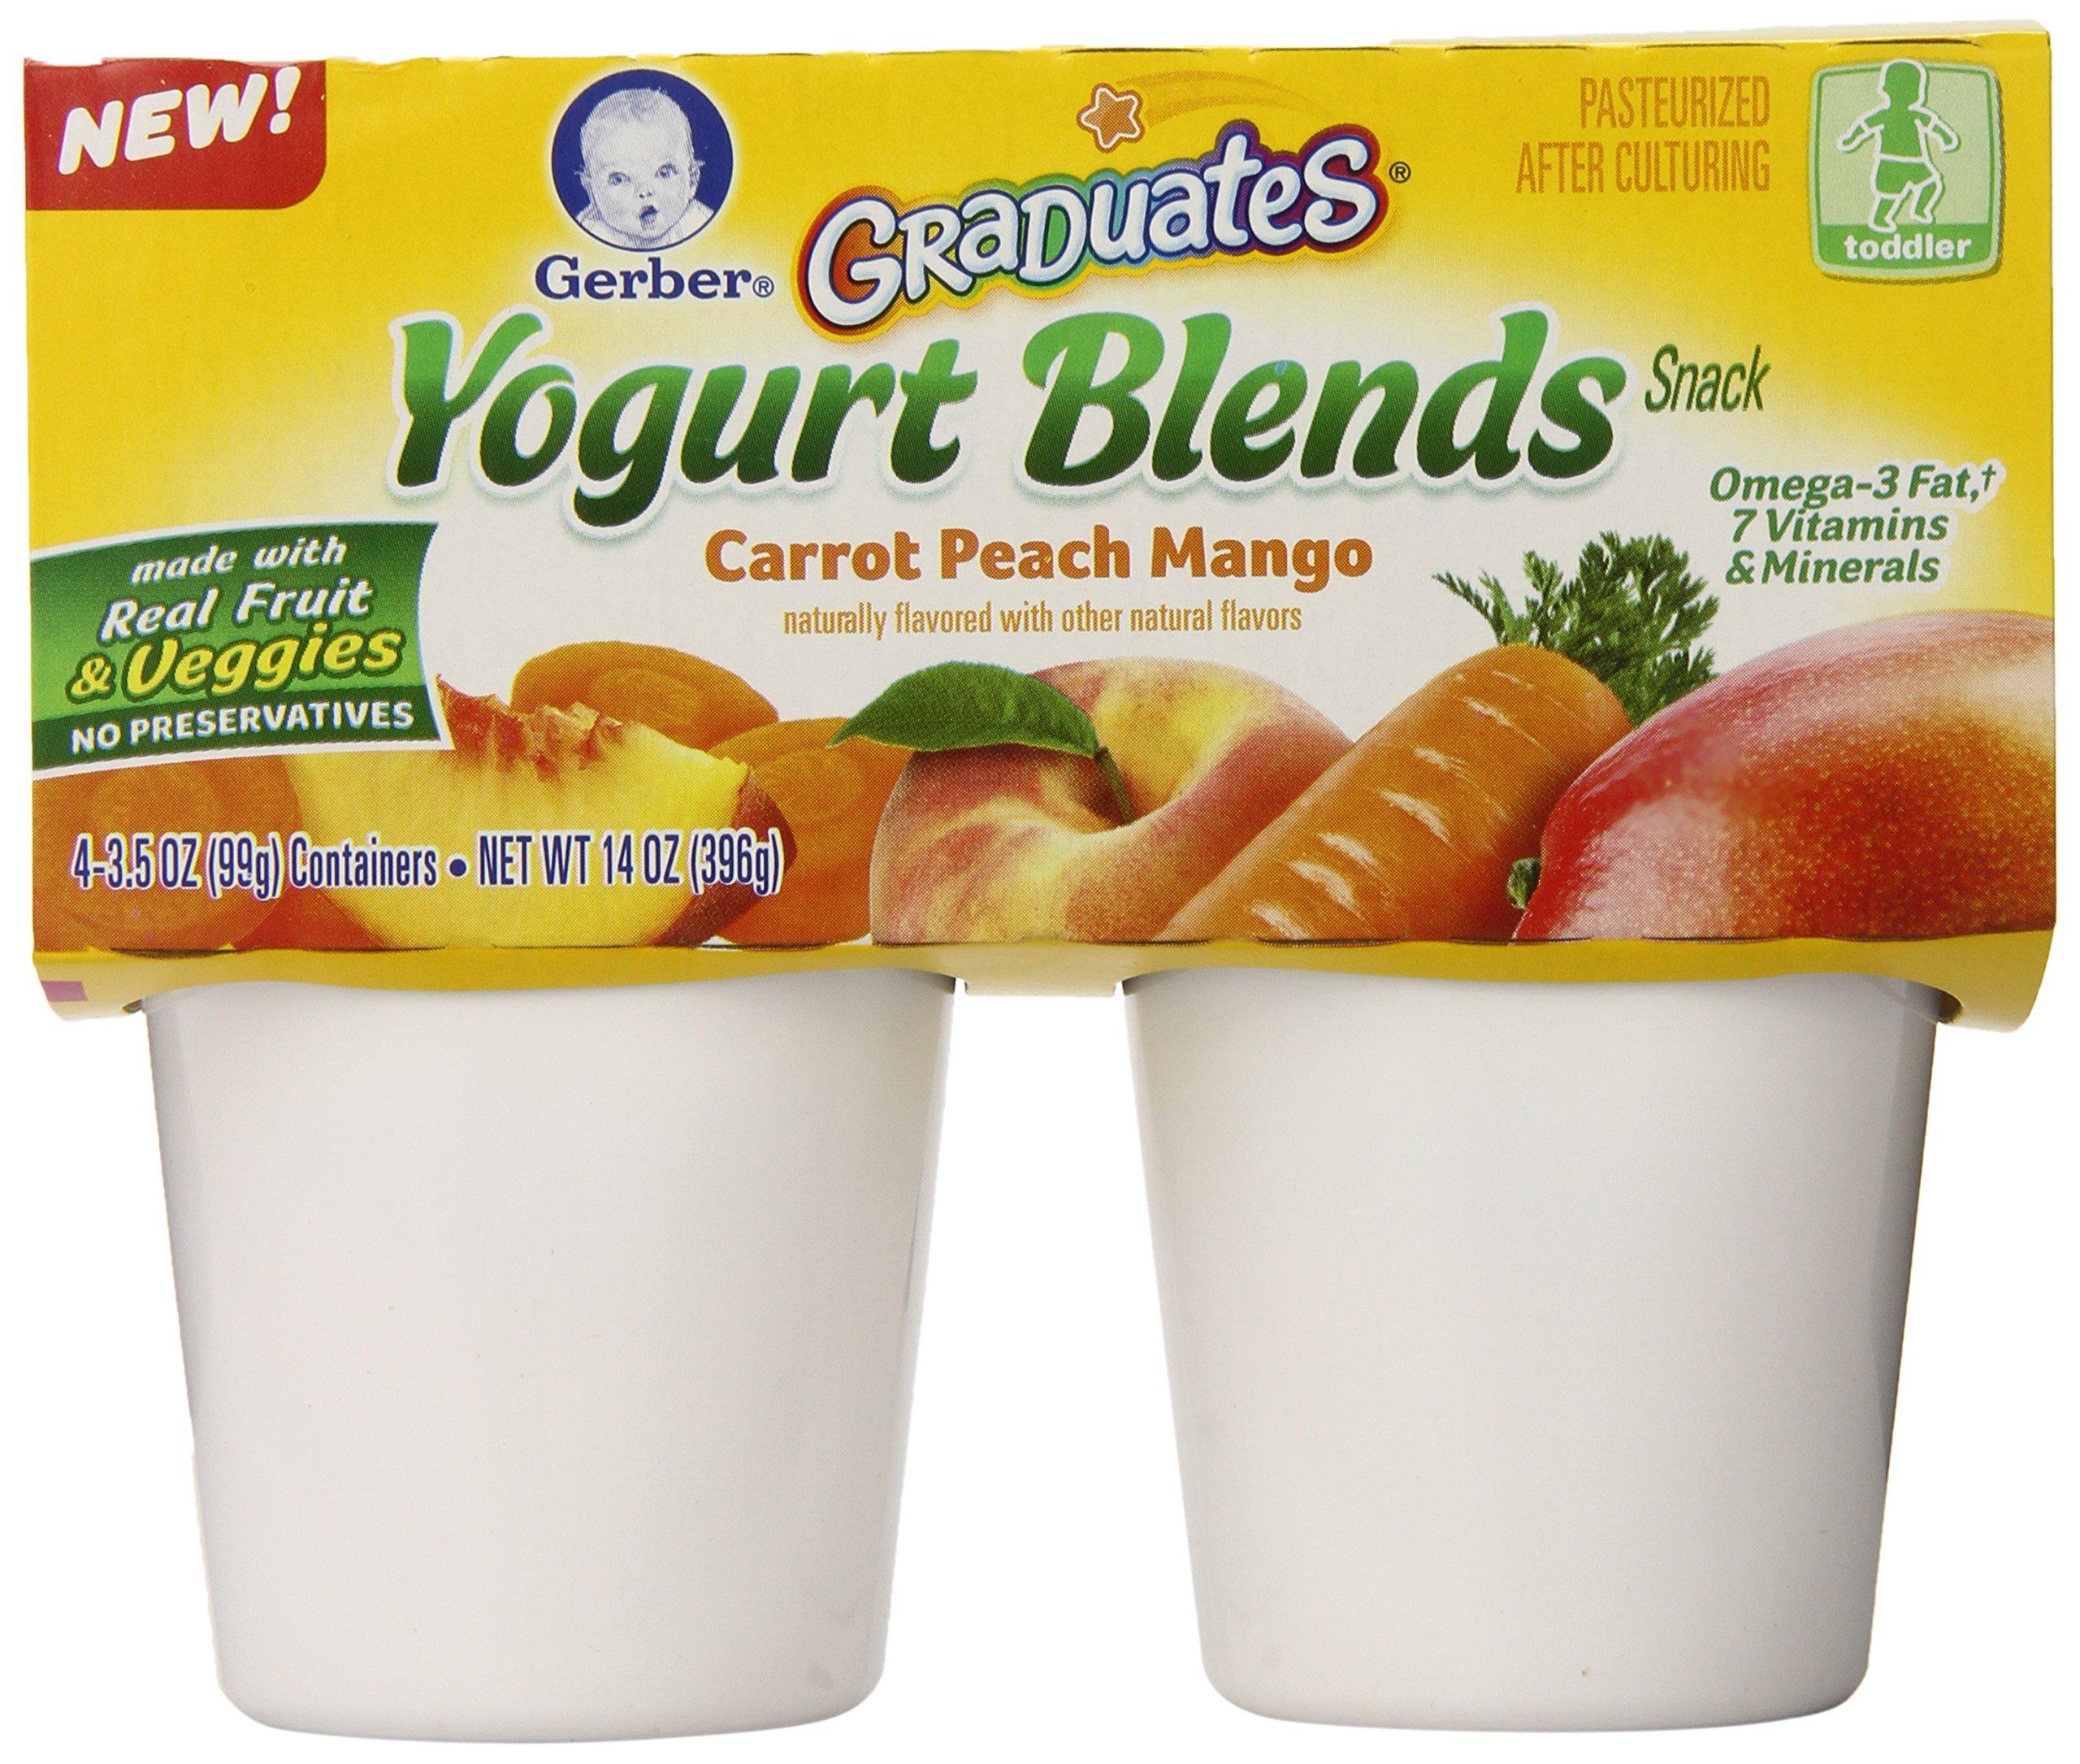 Gerber Graduates Yogurt Blends Snack, Carrot Peach Mango, 4 Count (Pack of 6)